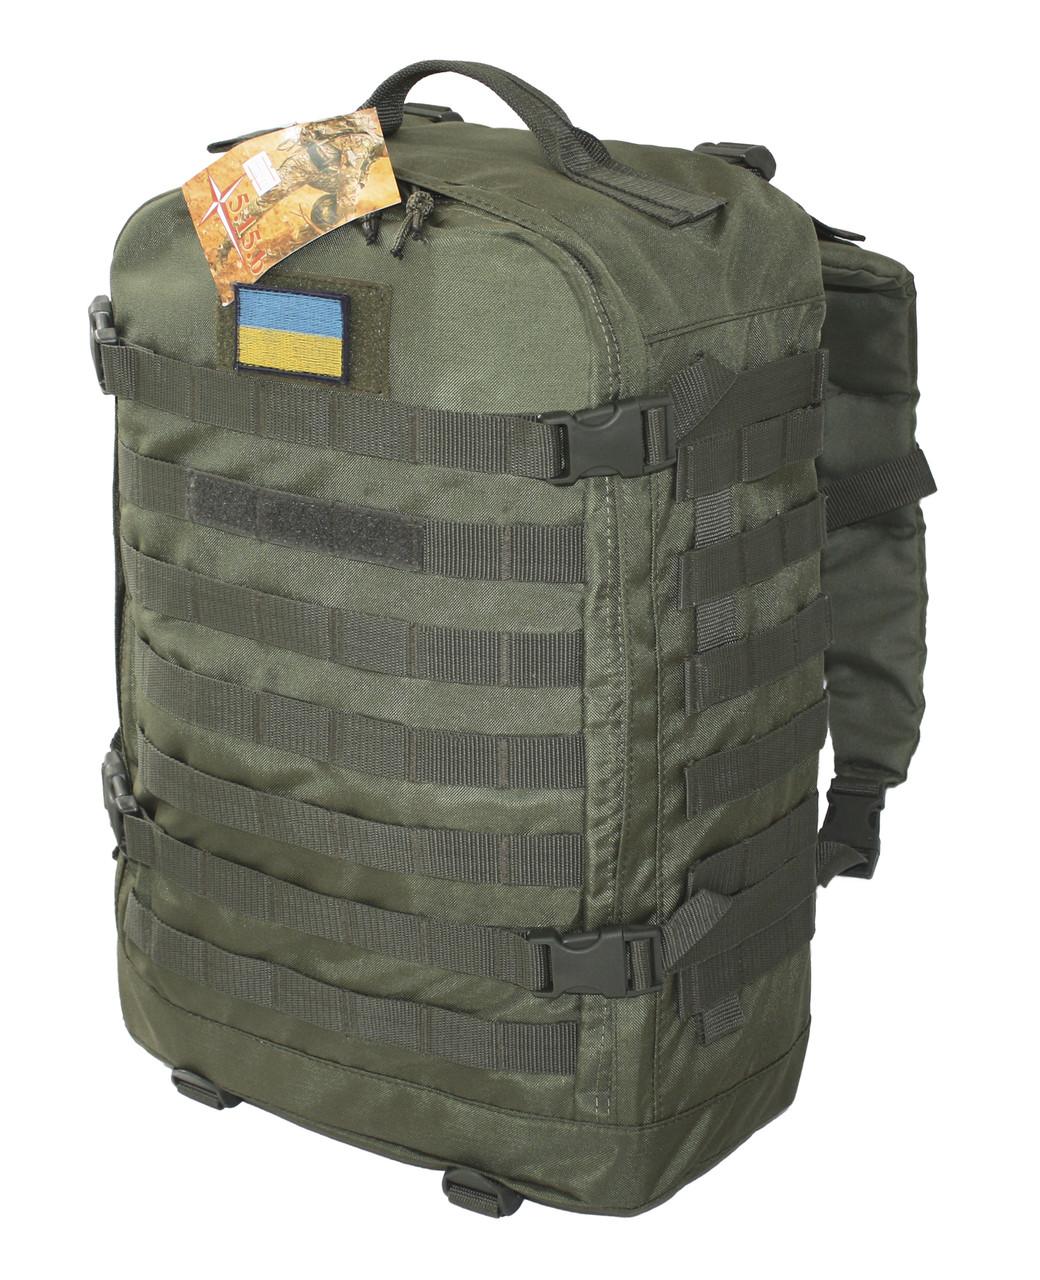 Тактический, штурмовой супер-крепкий рюкзак 32 литра олива. Армия, РБИ, РБІ